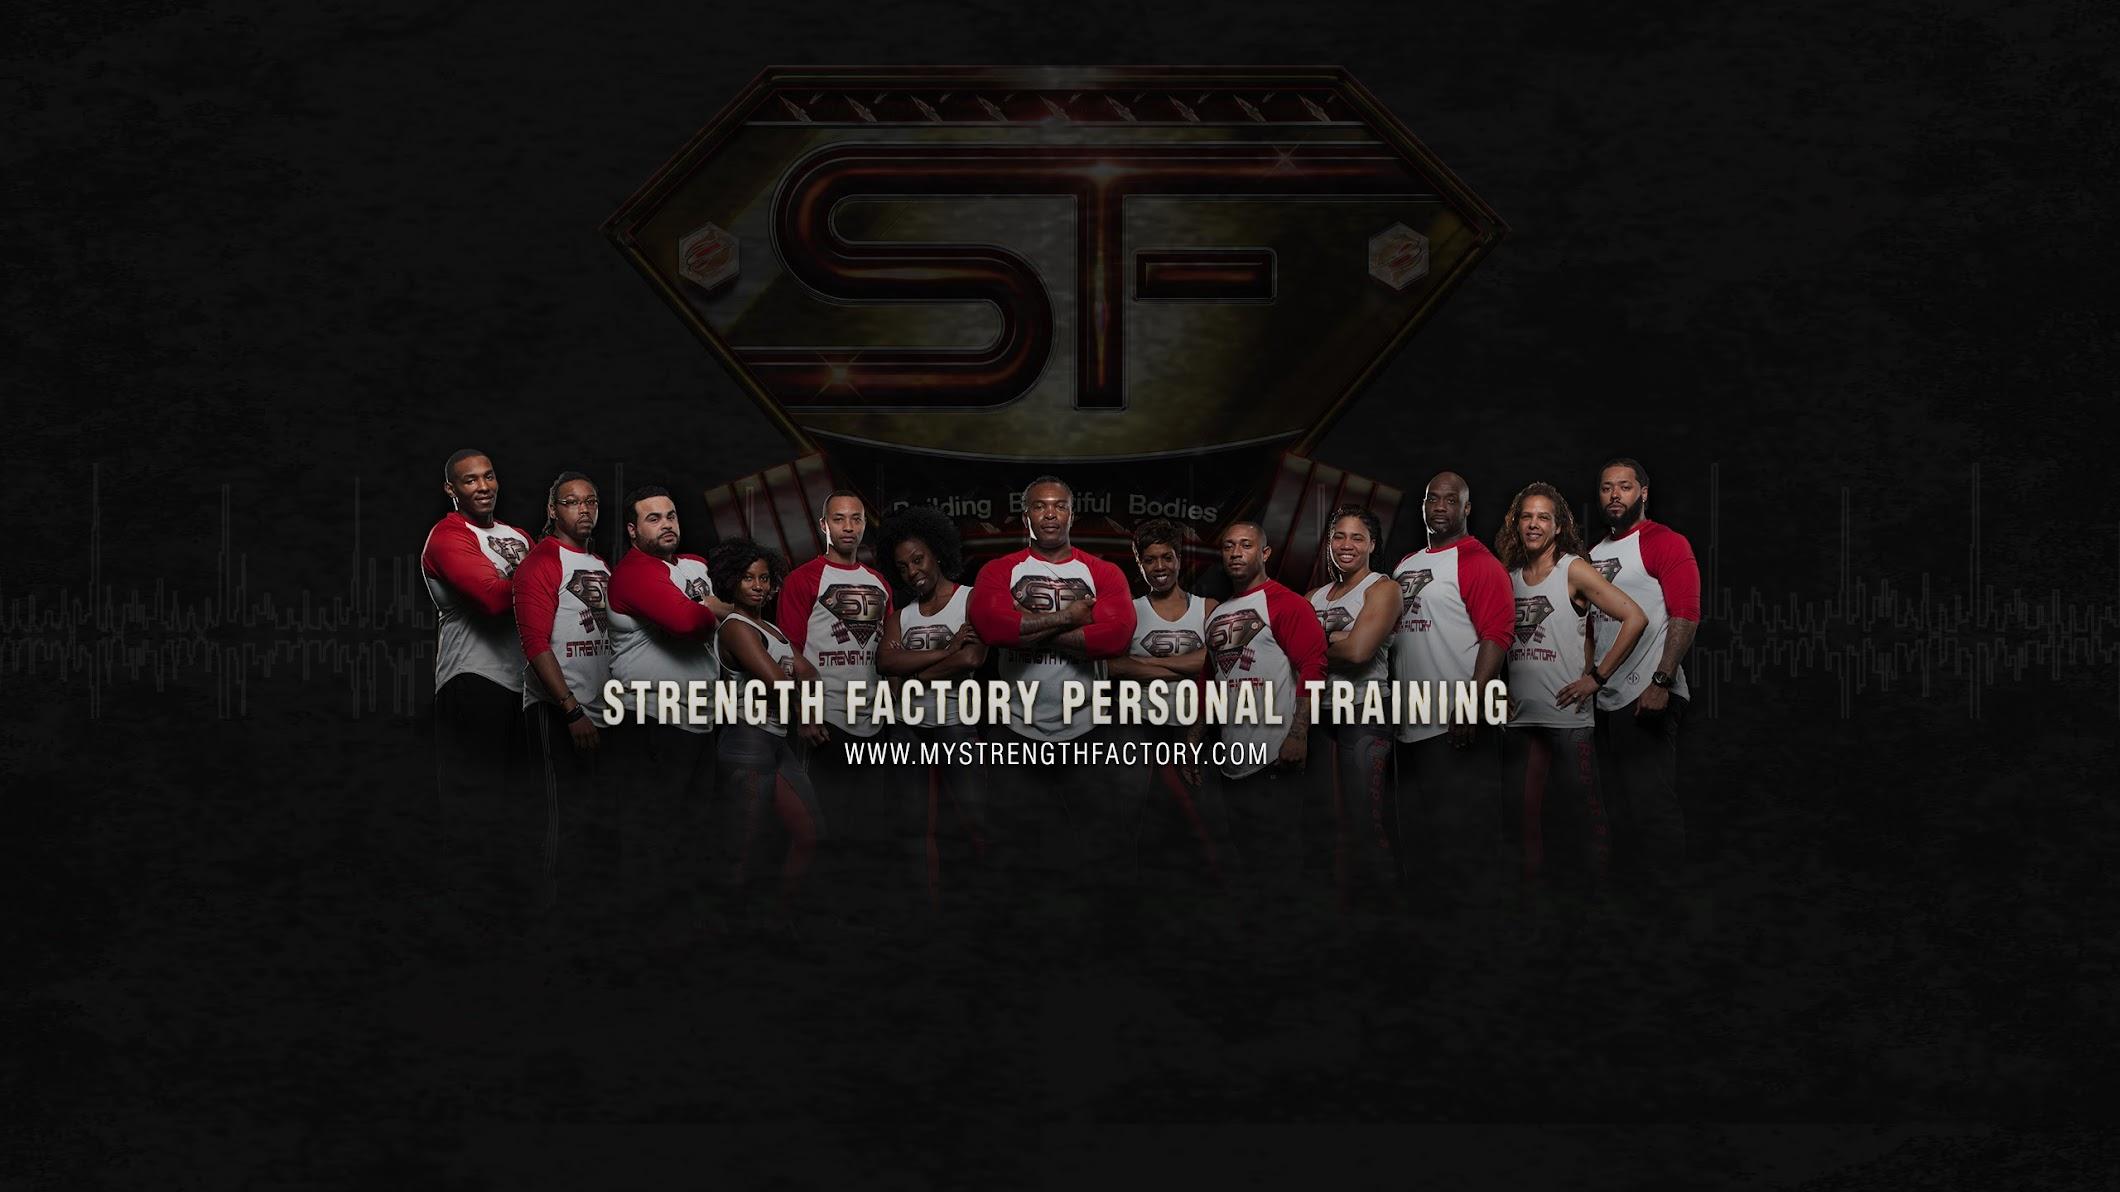 Strength Factory